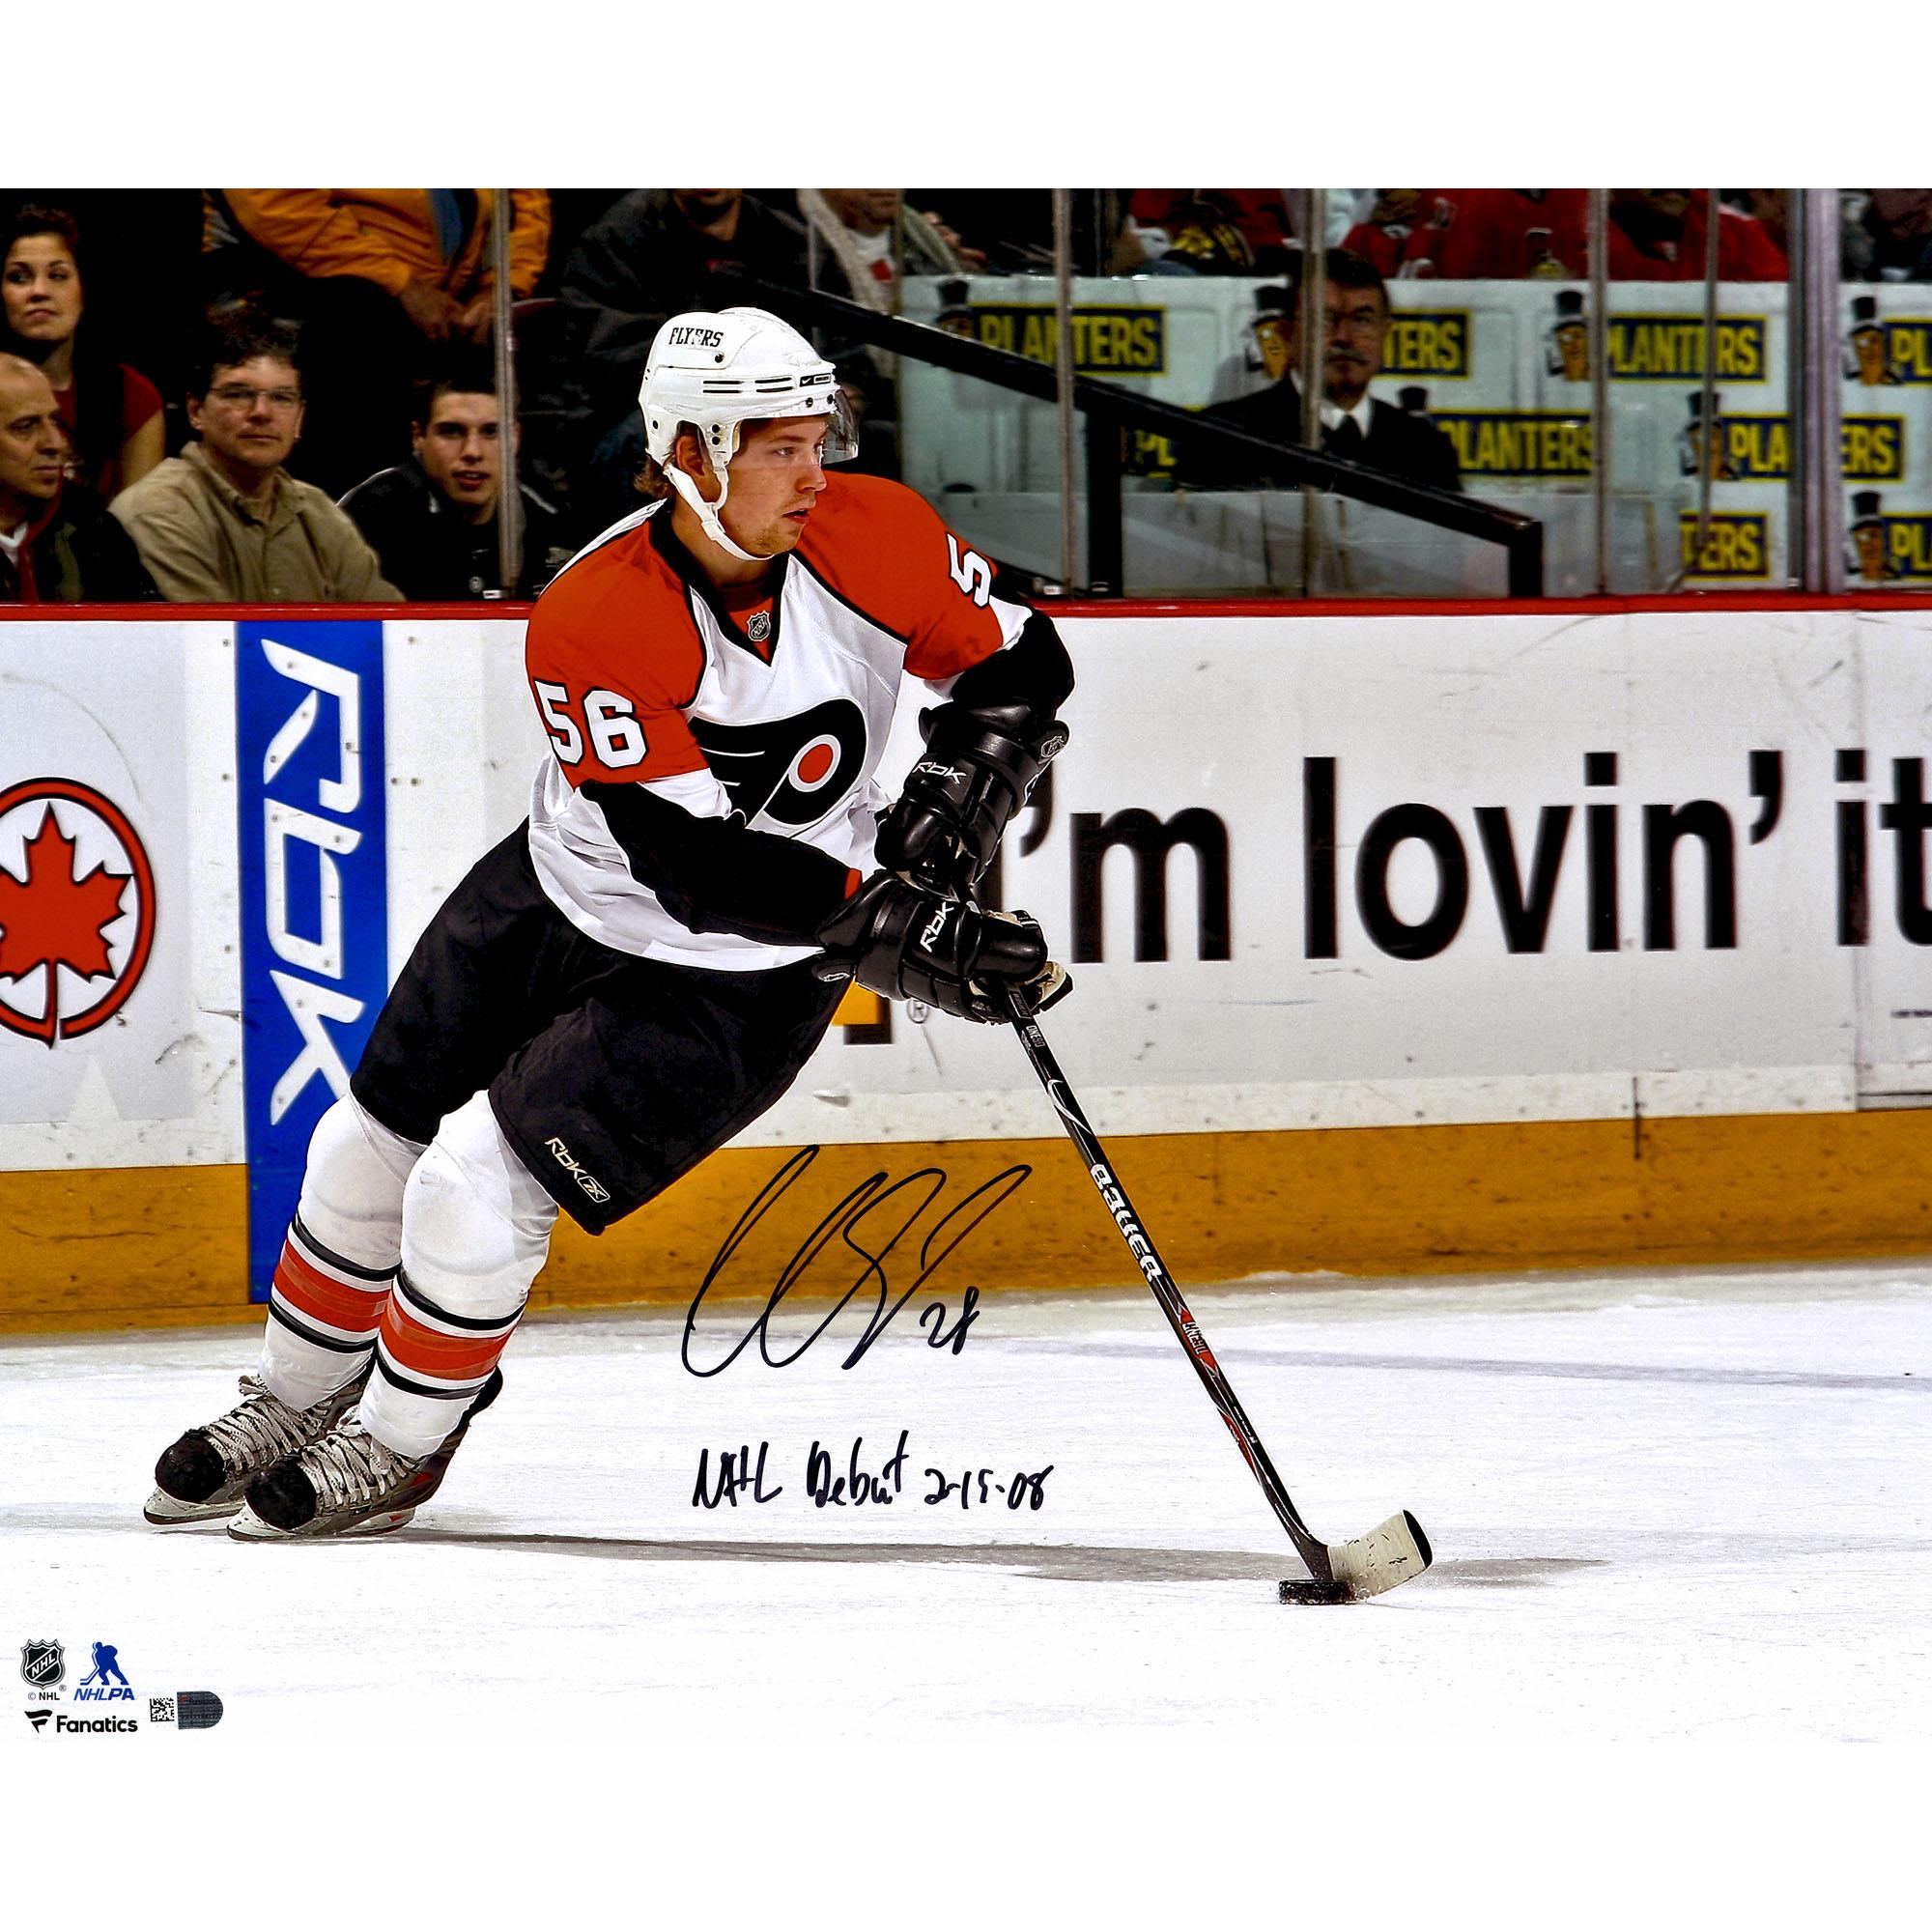 "Claude Giroux Philadelphia Flyers Fanatics Authentic Autographed 16"" x 20"" White Jersey Skating Photograph... by Fanatics Authentic"